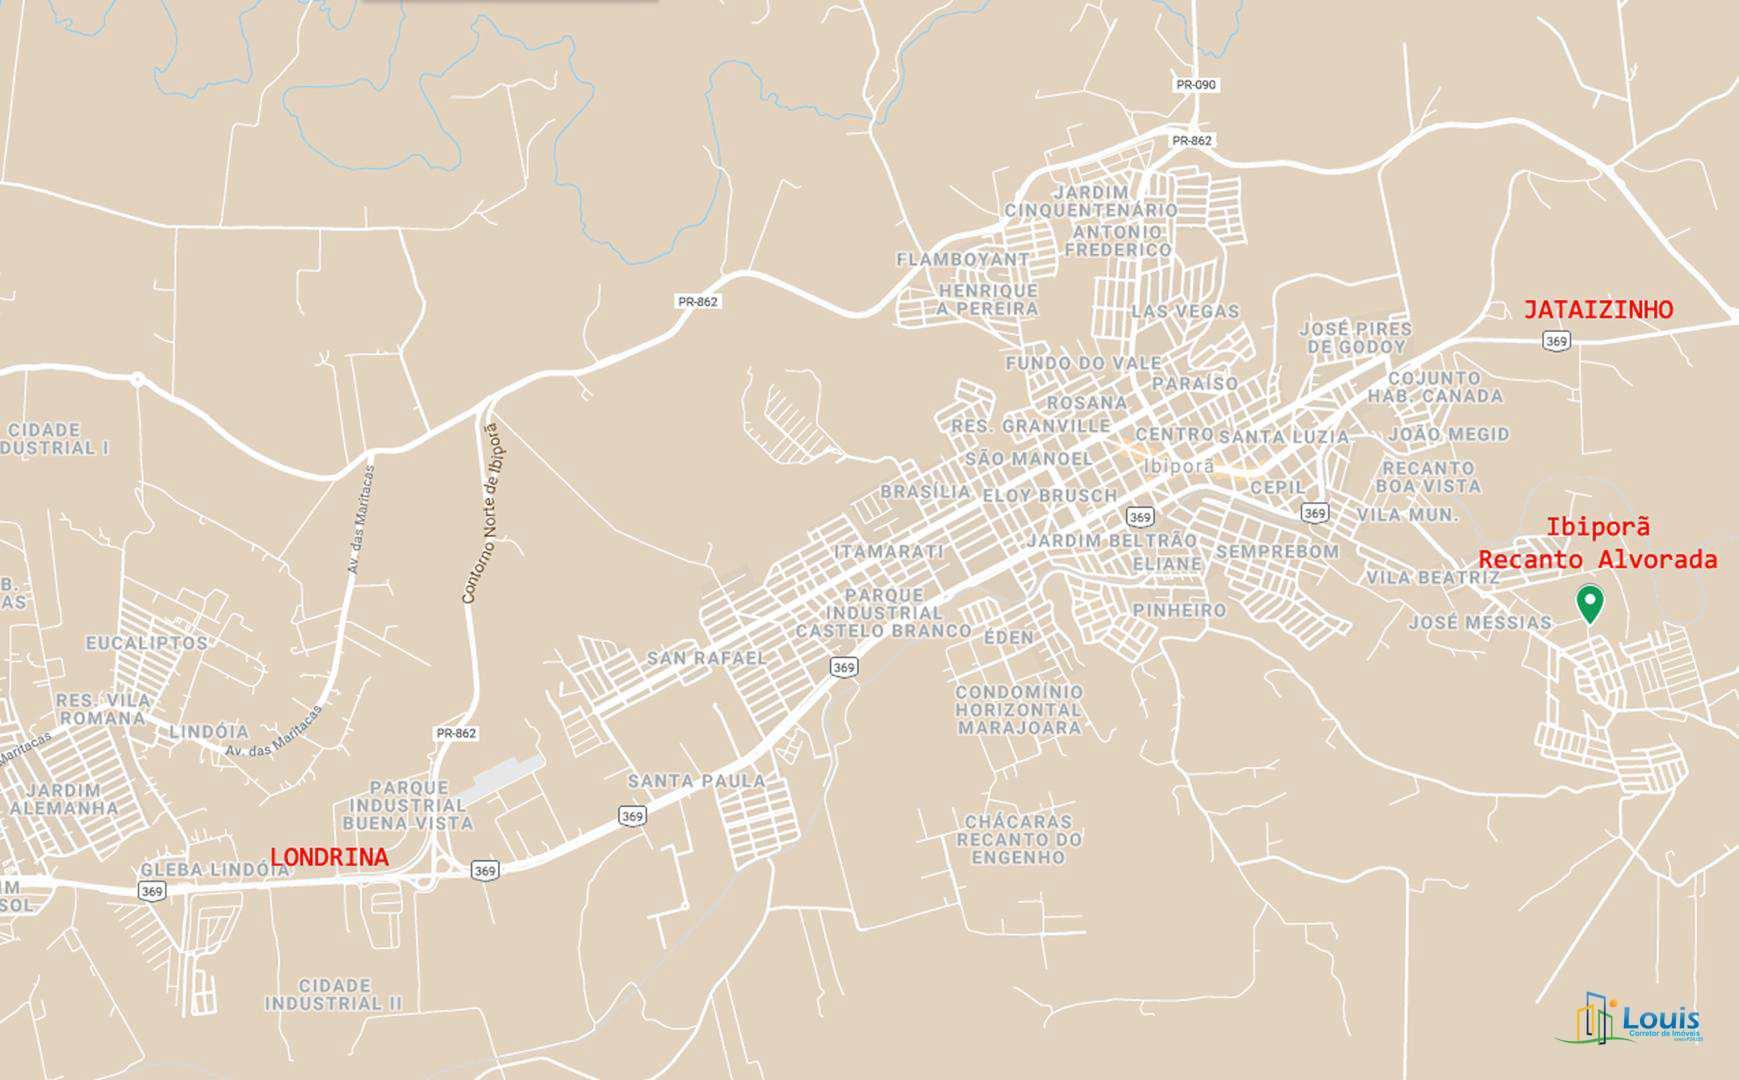 Terreno 318,75m², Recanto Alvorada (LT 07), Ibiporã/PR